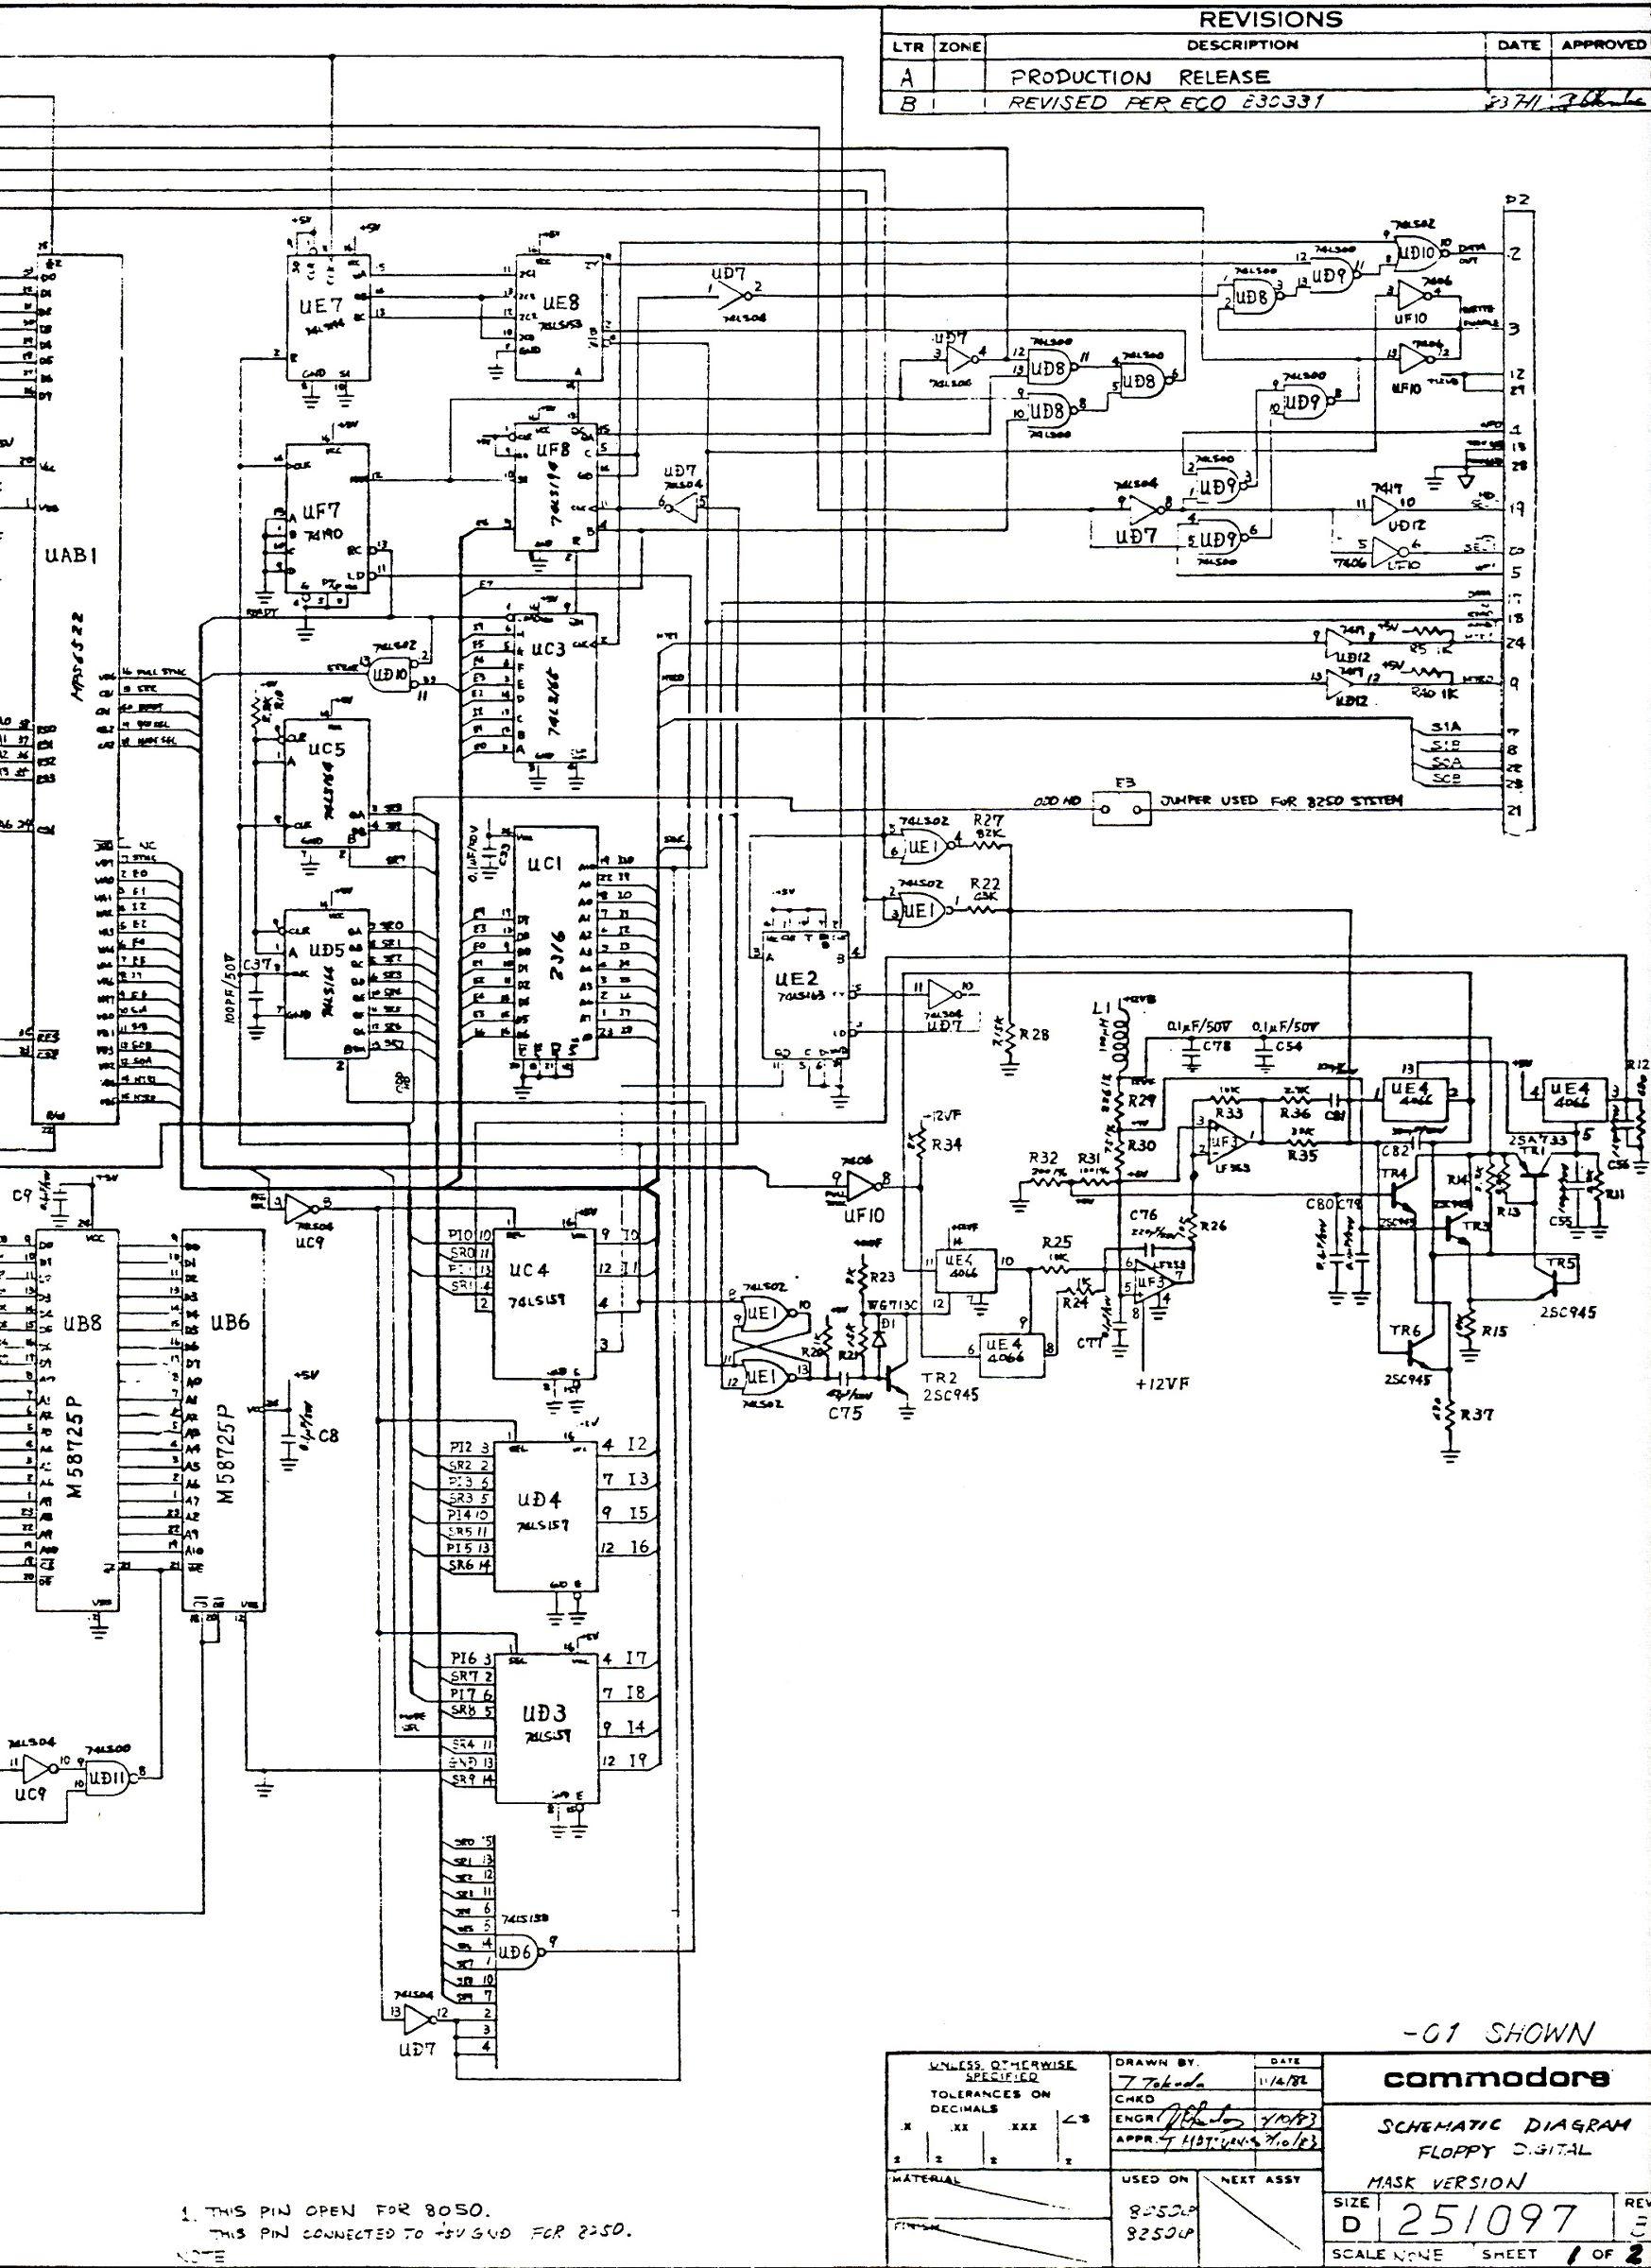 /pub/cbm/schematics/drives/old/8050/